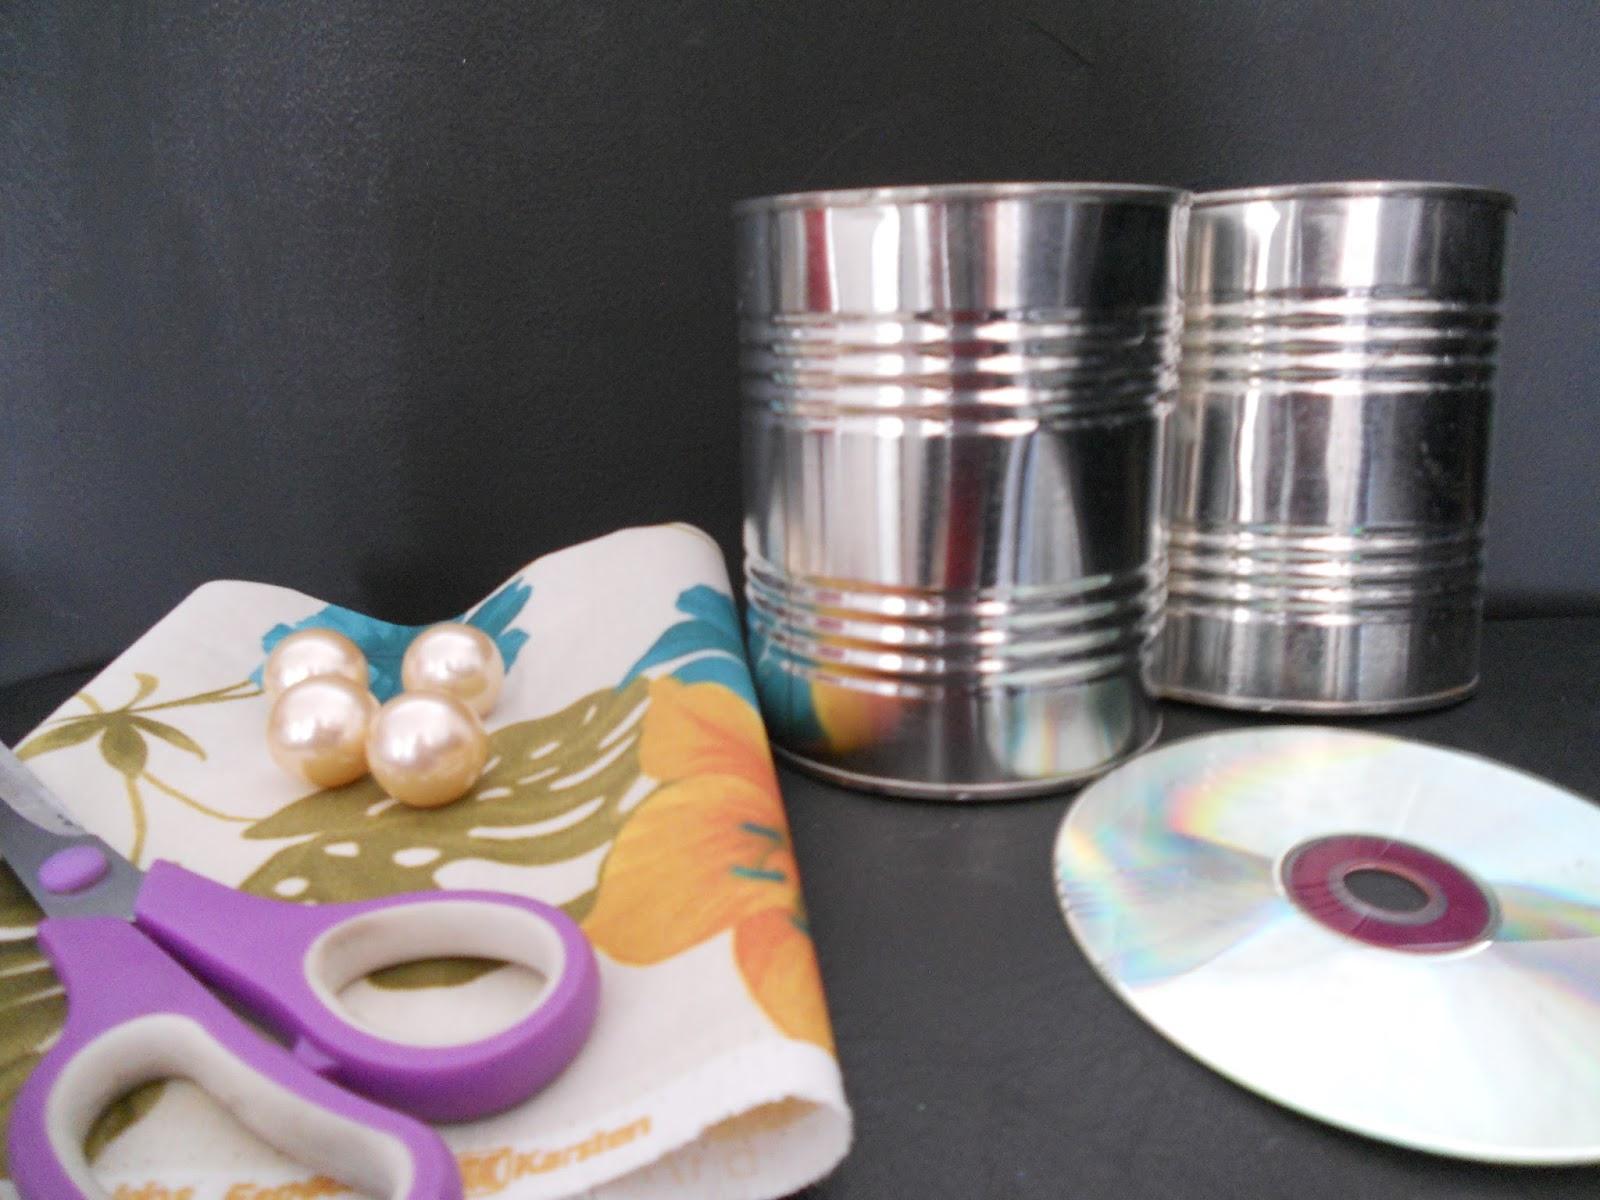 de 1 cd 2 latas vazias de leite tecido 4 perolás 1 tesoura 1 cola  #956C36 1600x1200